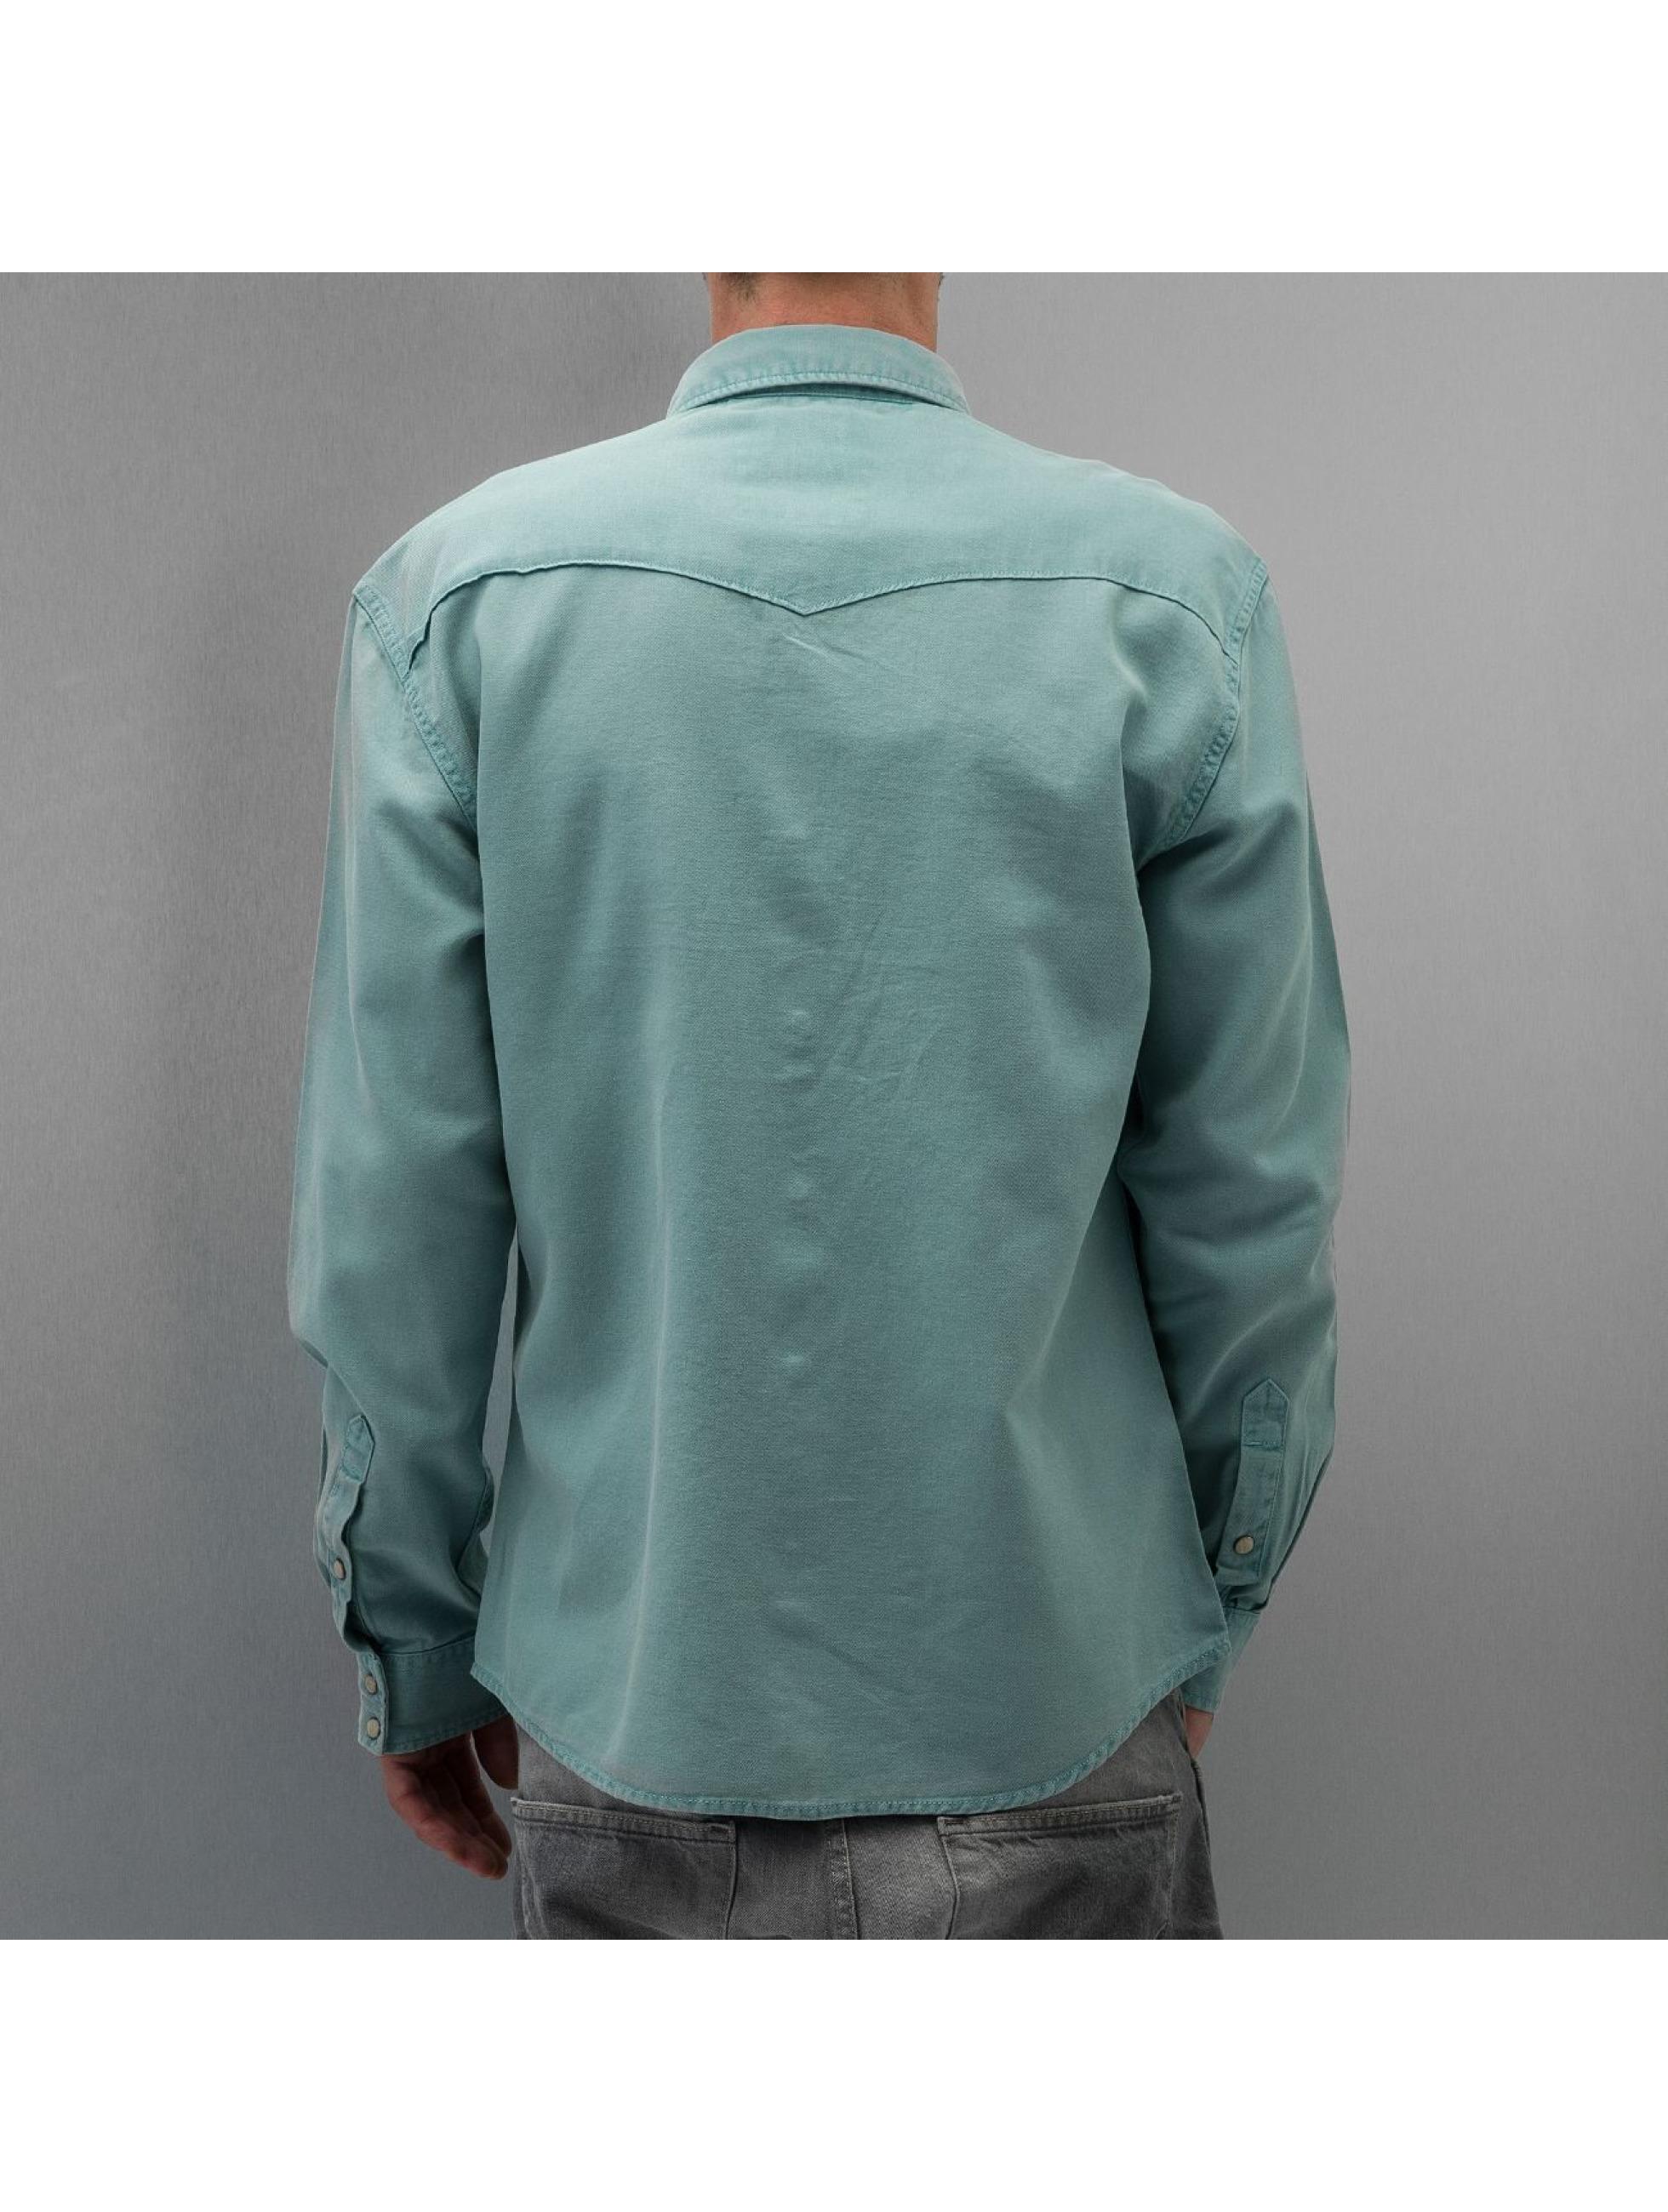 Selected Рубашка May Fair зеленый